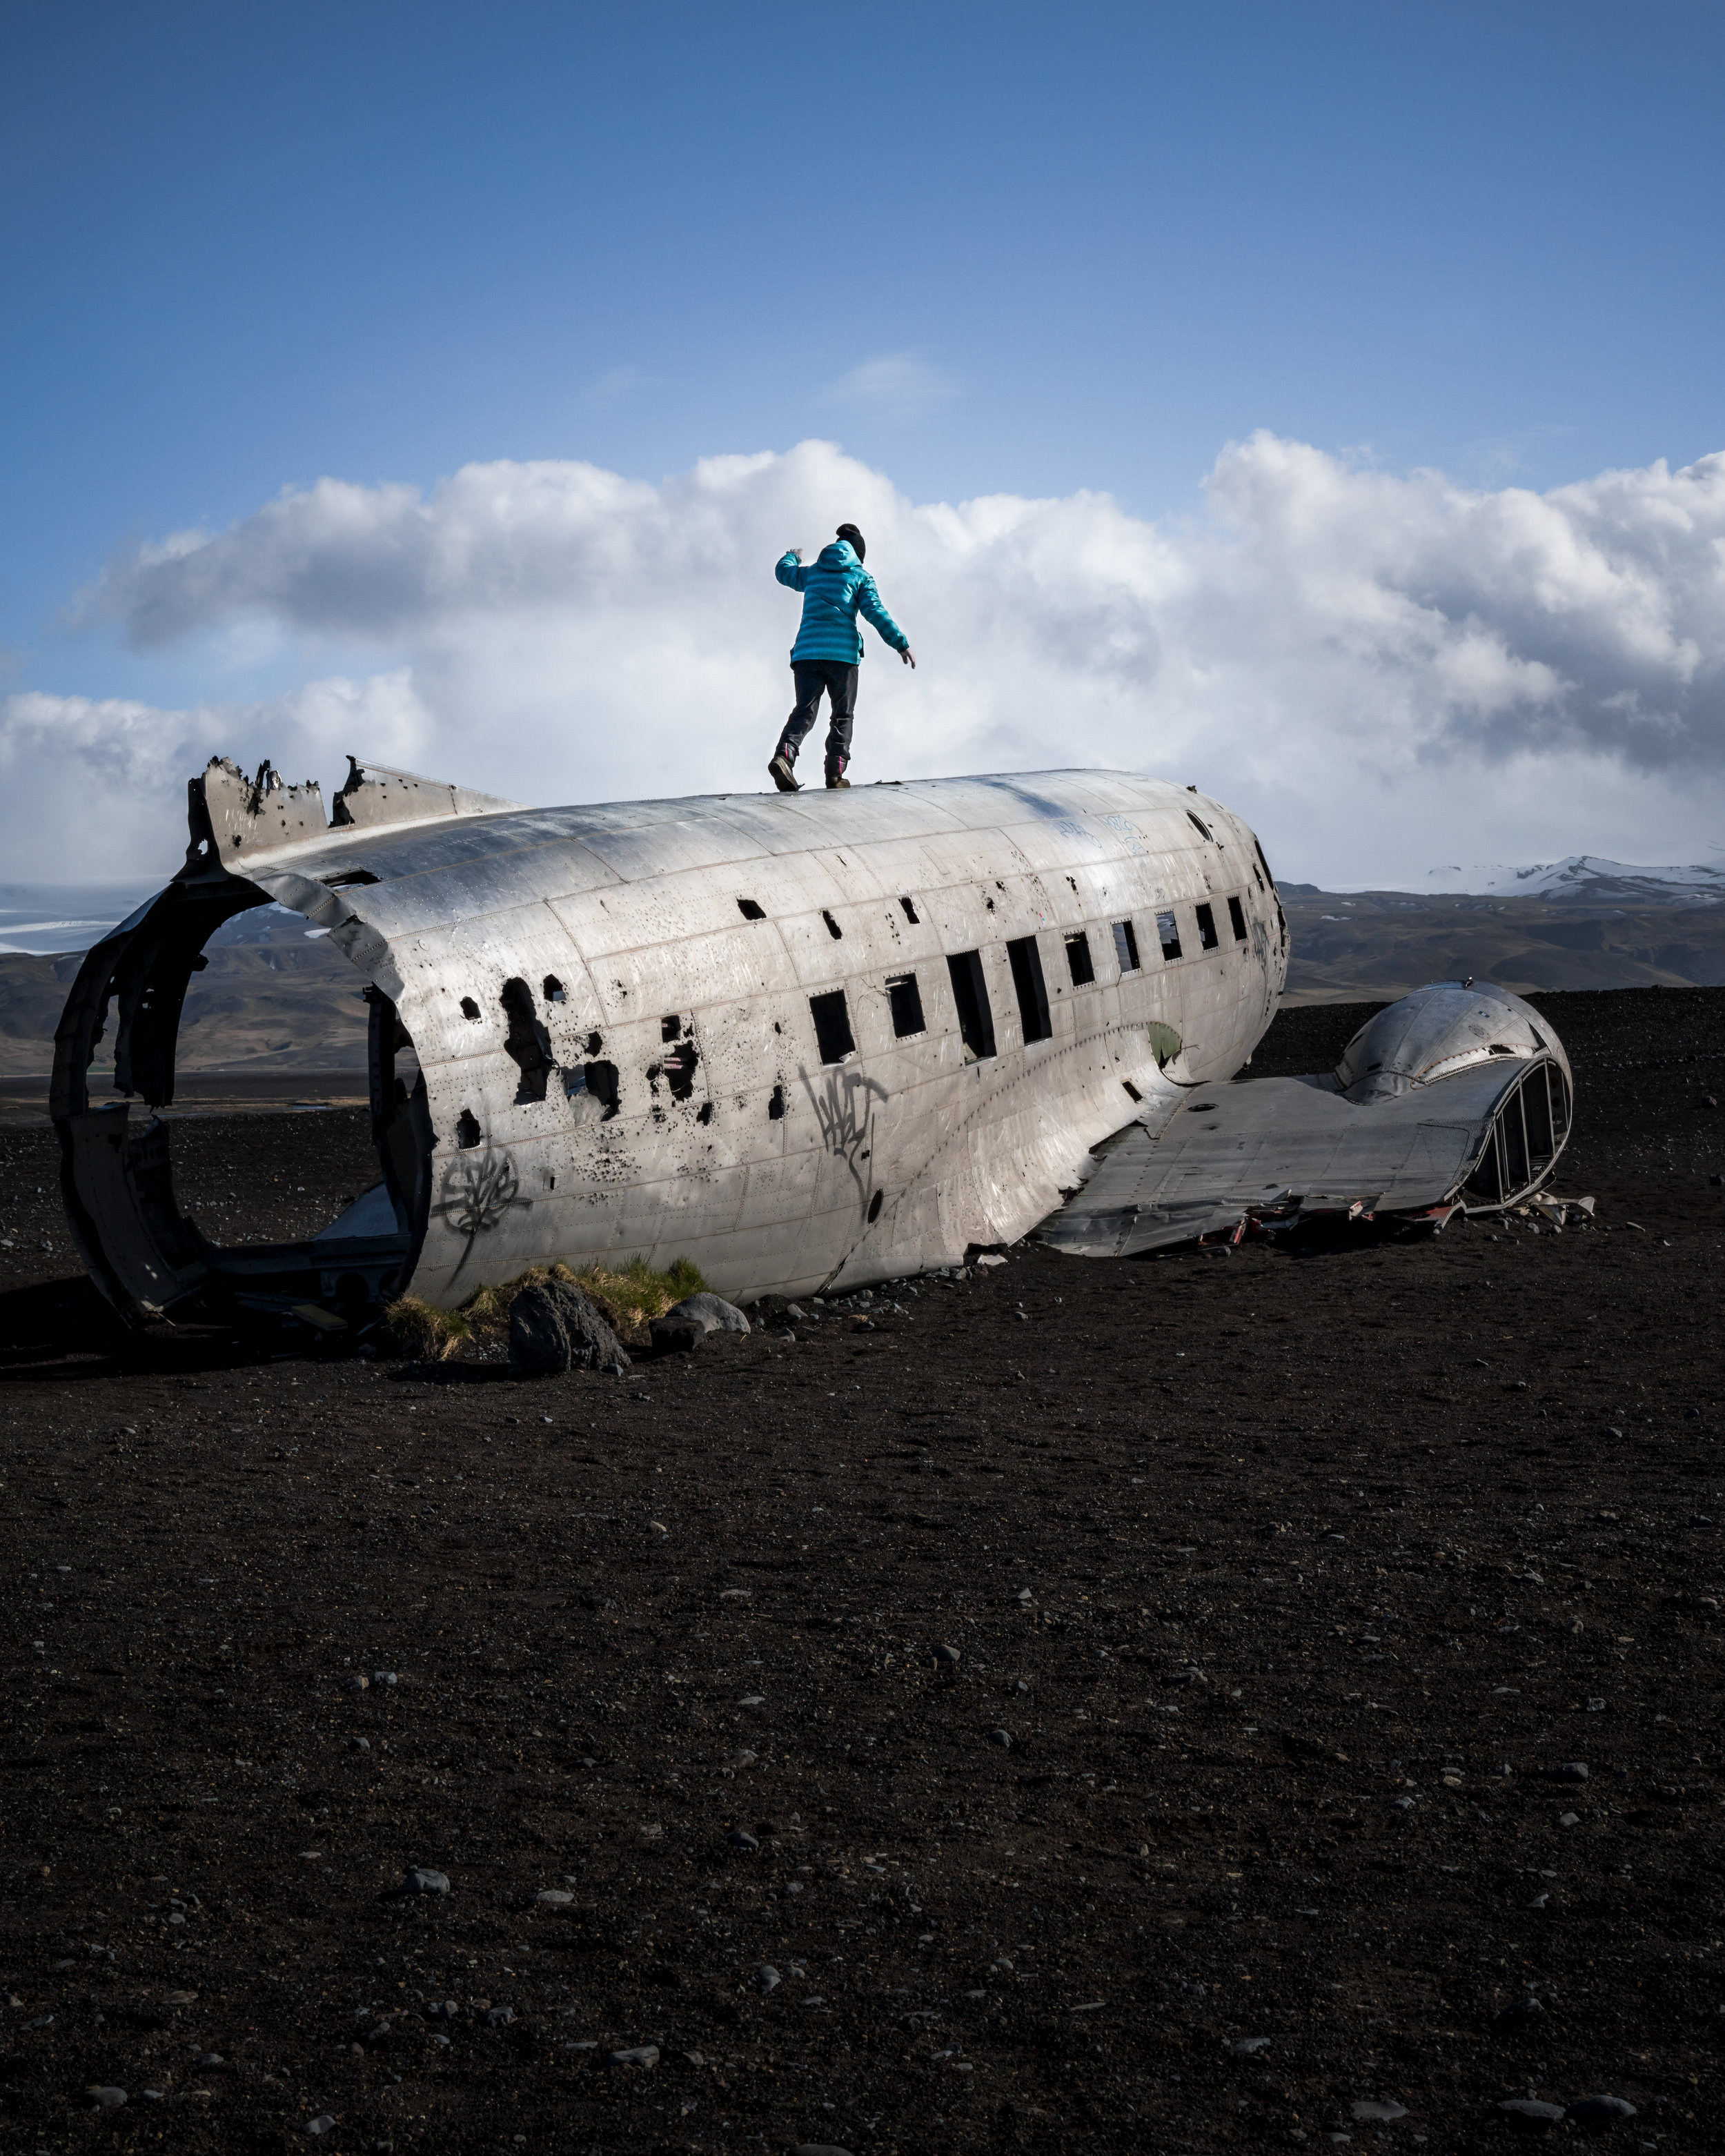 Becca-Iceland-Plane.jpg